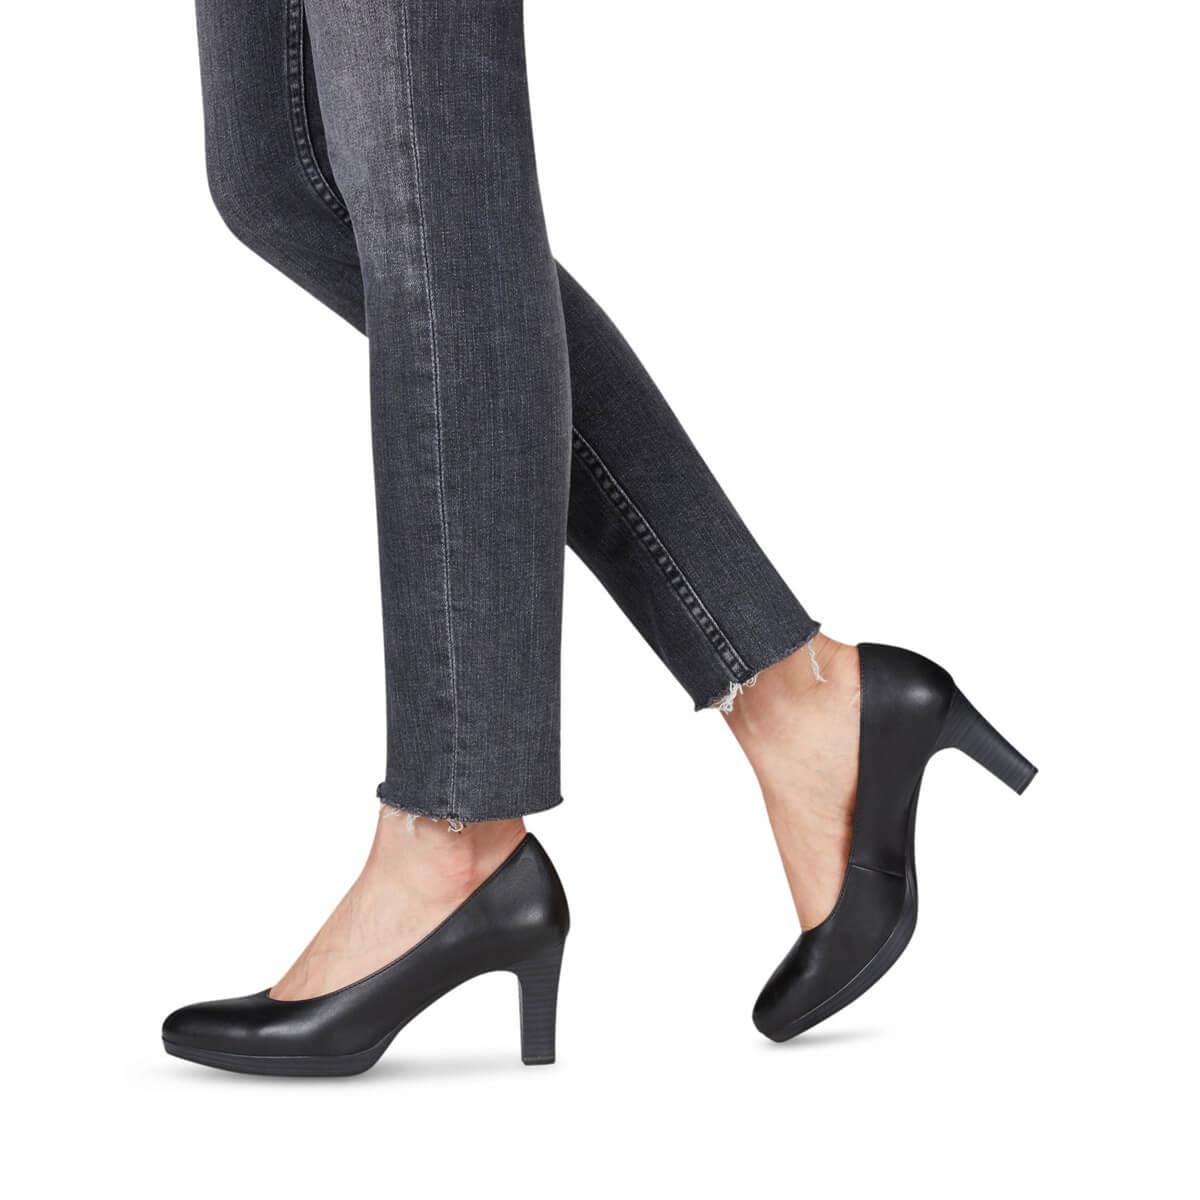 b32768113f Tamaris platformos magassarkú cipő 7,5 cm-es sarokkal, fekete színben